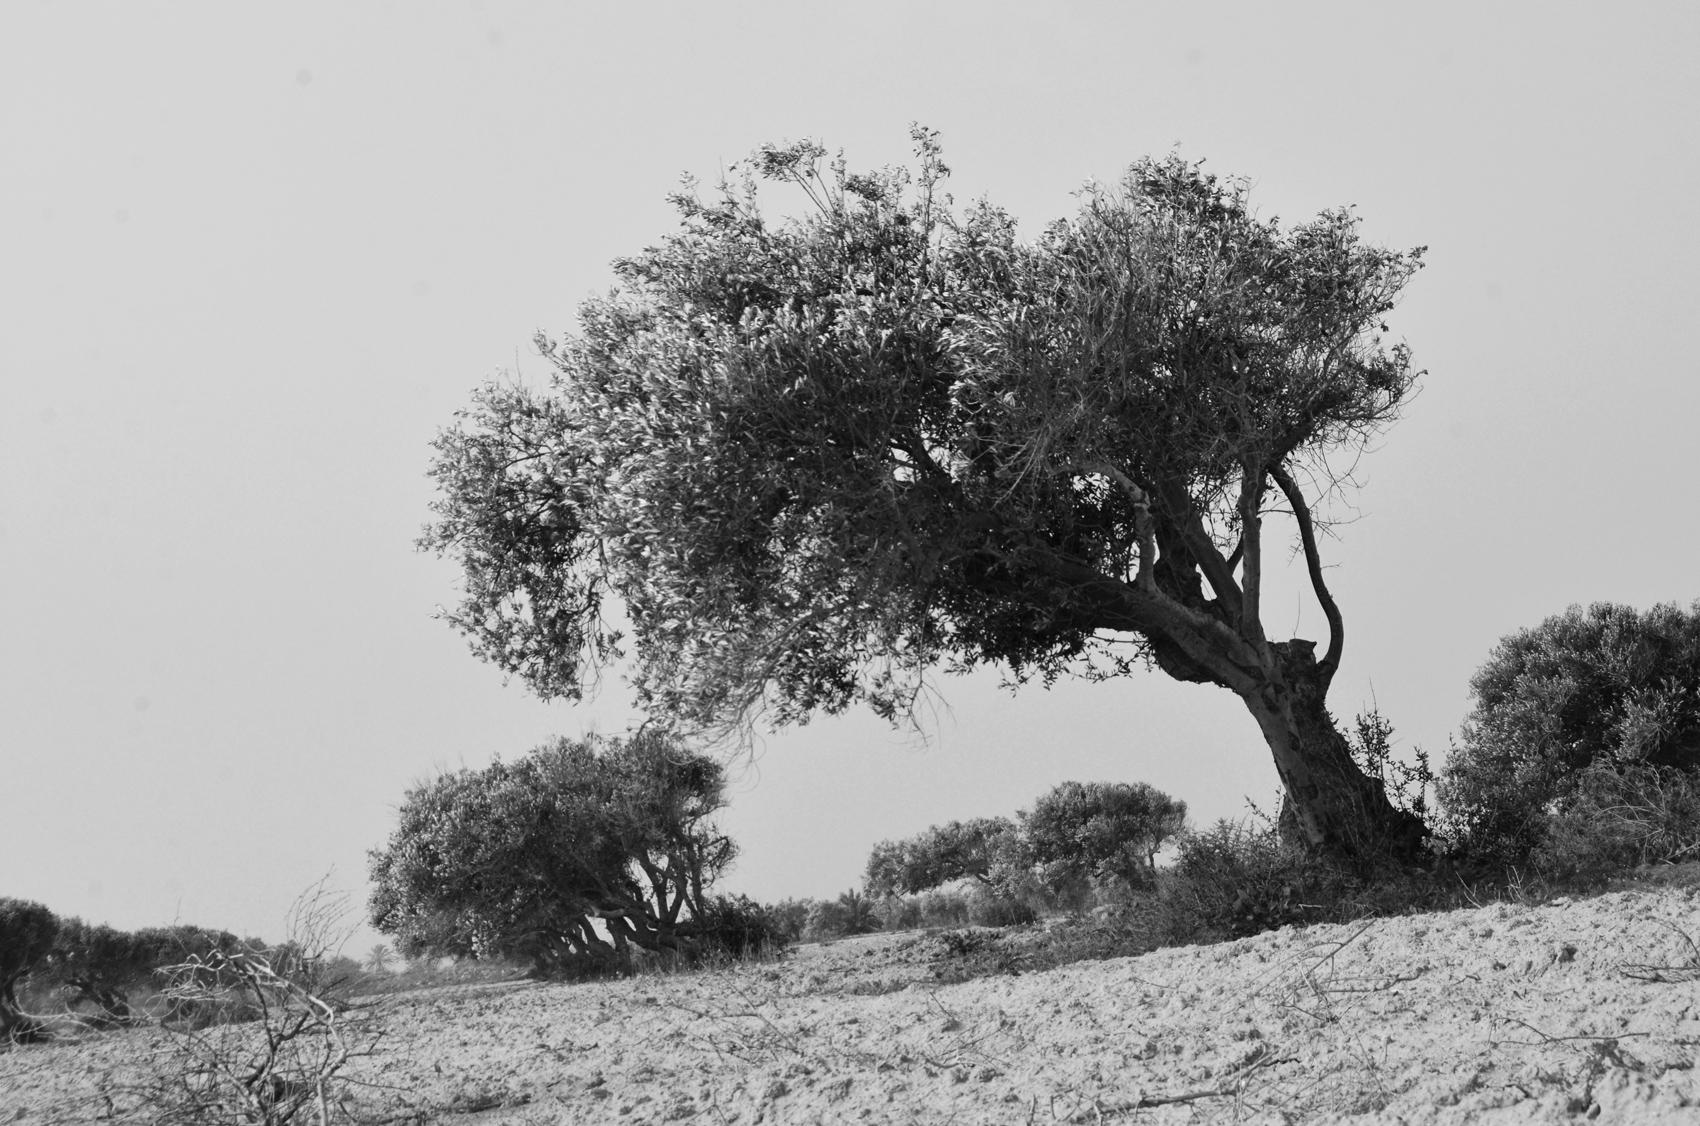 Olive trees near Ben Guerdane.